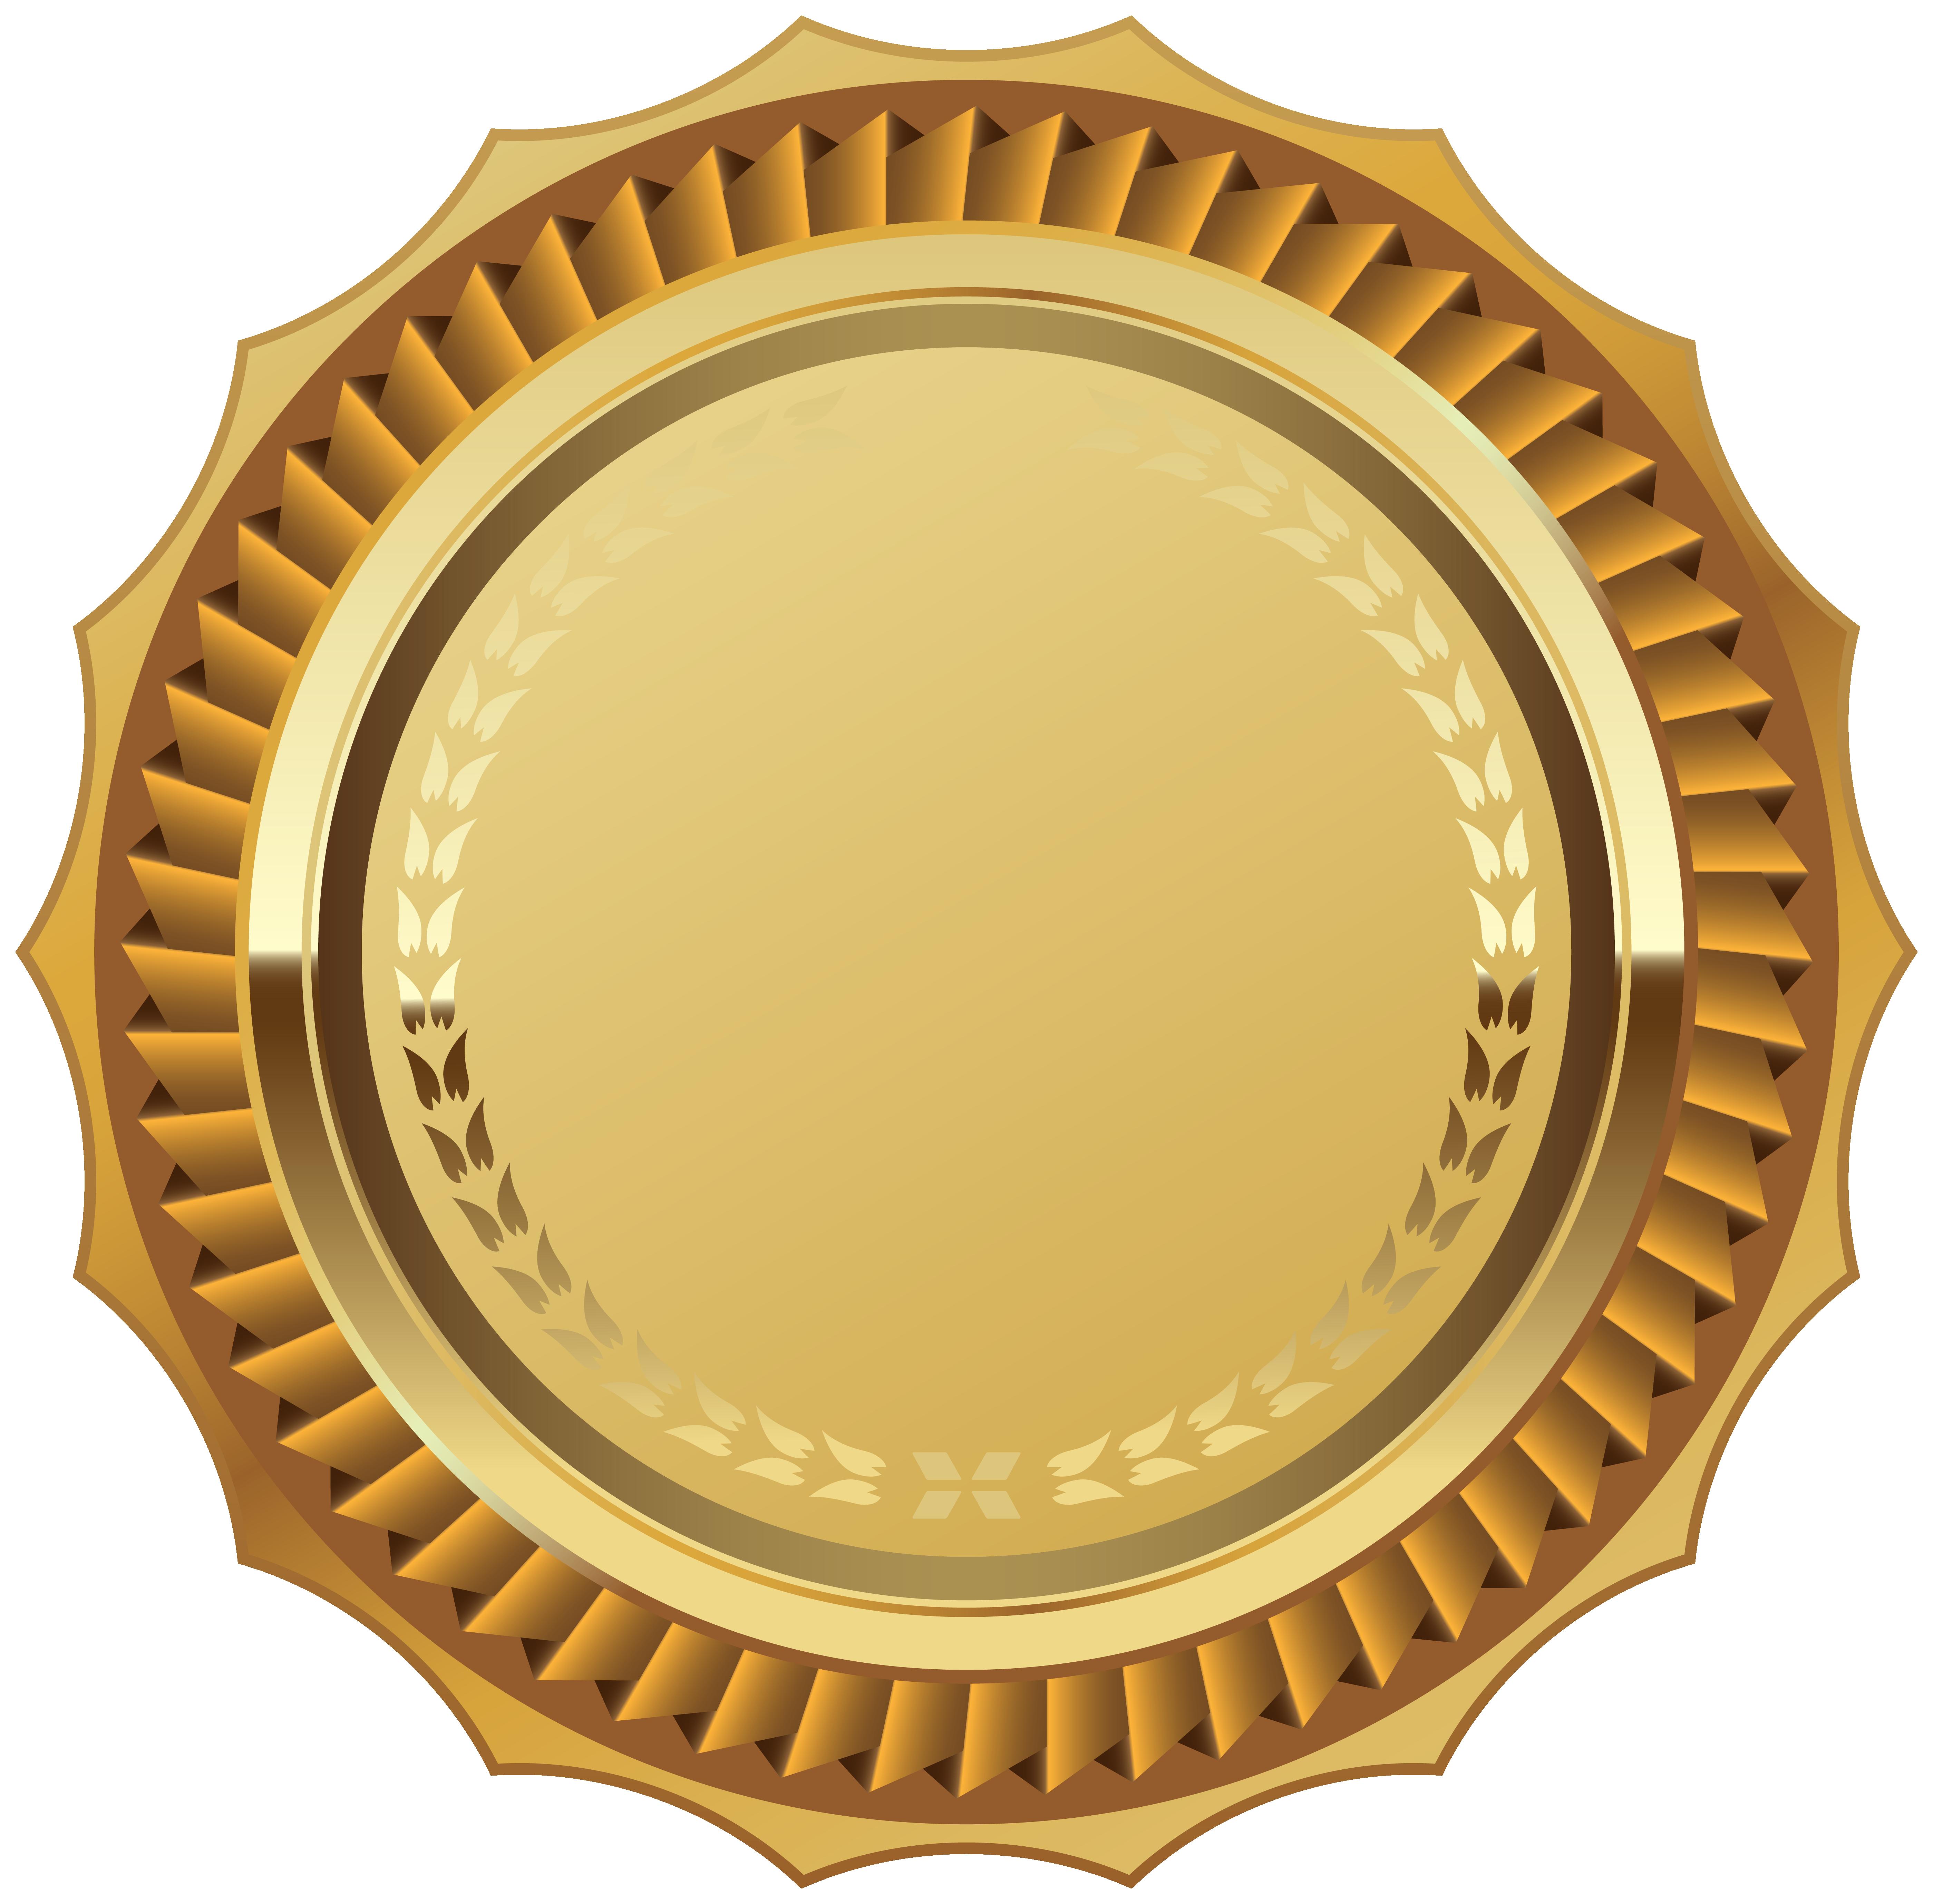 Gold Seal With Ribbon Png Clipart Image Bingkai Desain Banner Desain